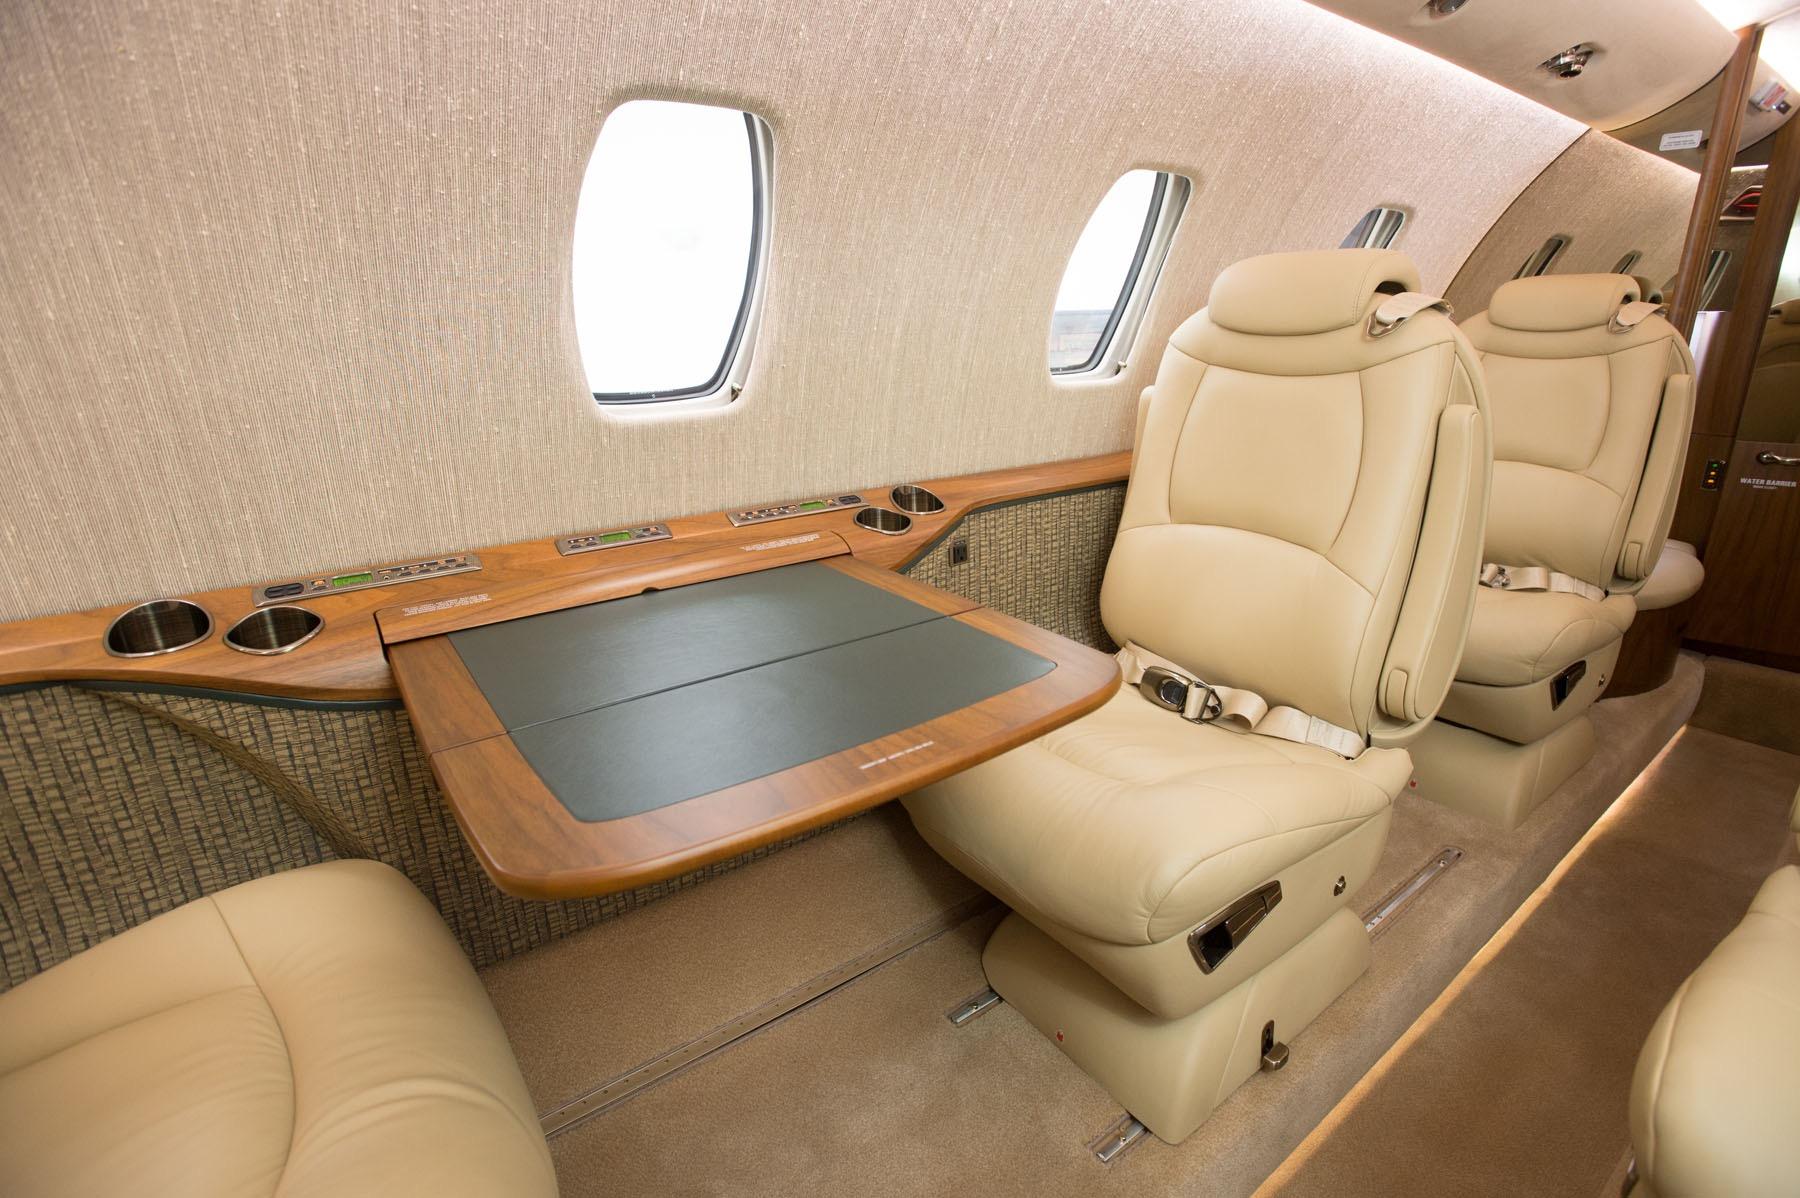 Citation-XLS+_Mid Jet_int-2_Legacy_Aviation_Private_Jet_NetJets_Jet_Charter_TEB_VNY_MIA_PBI_FRG_SFO_FLL_FXE_BED.jpg